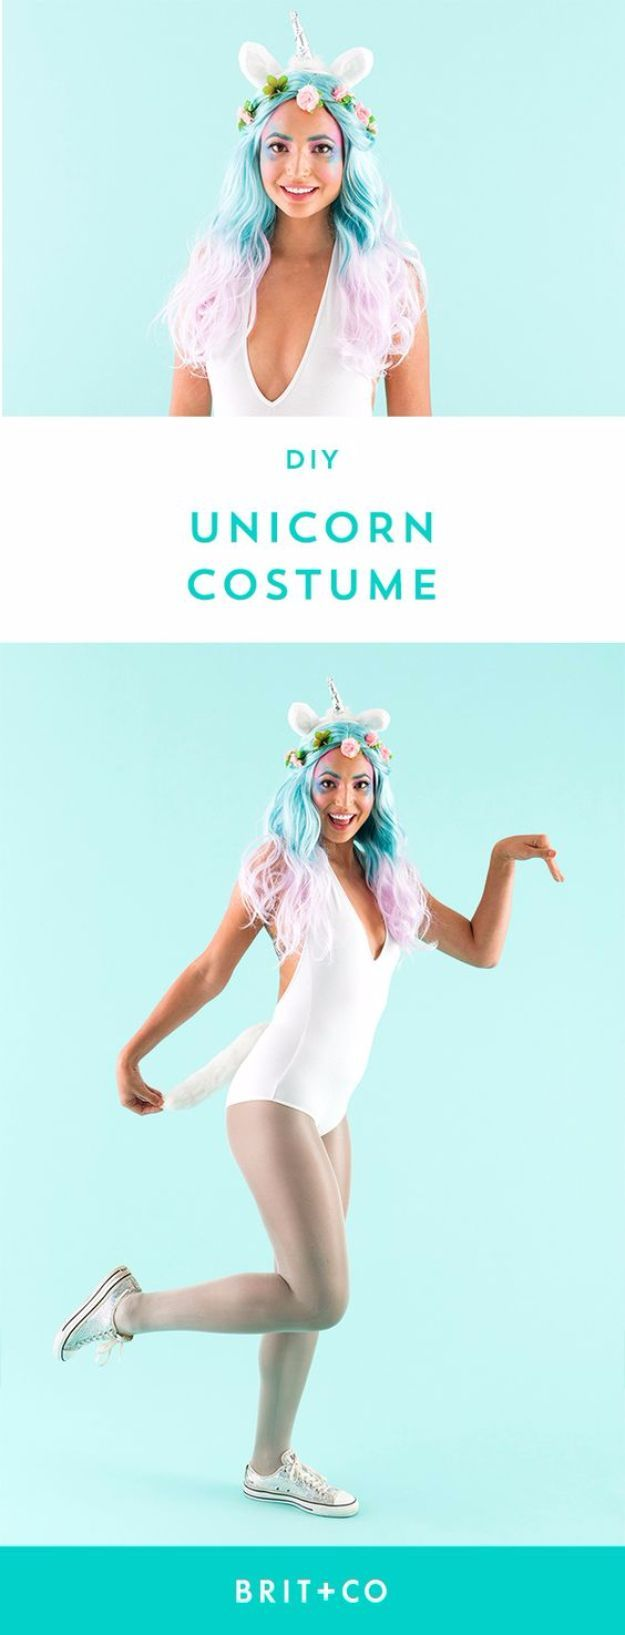 Best diy halloween costume ideas diy unicorn costume do it best diy halloween costume ideas diy unicorn costume do it yourself costumes solutioingenieria Gallery